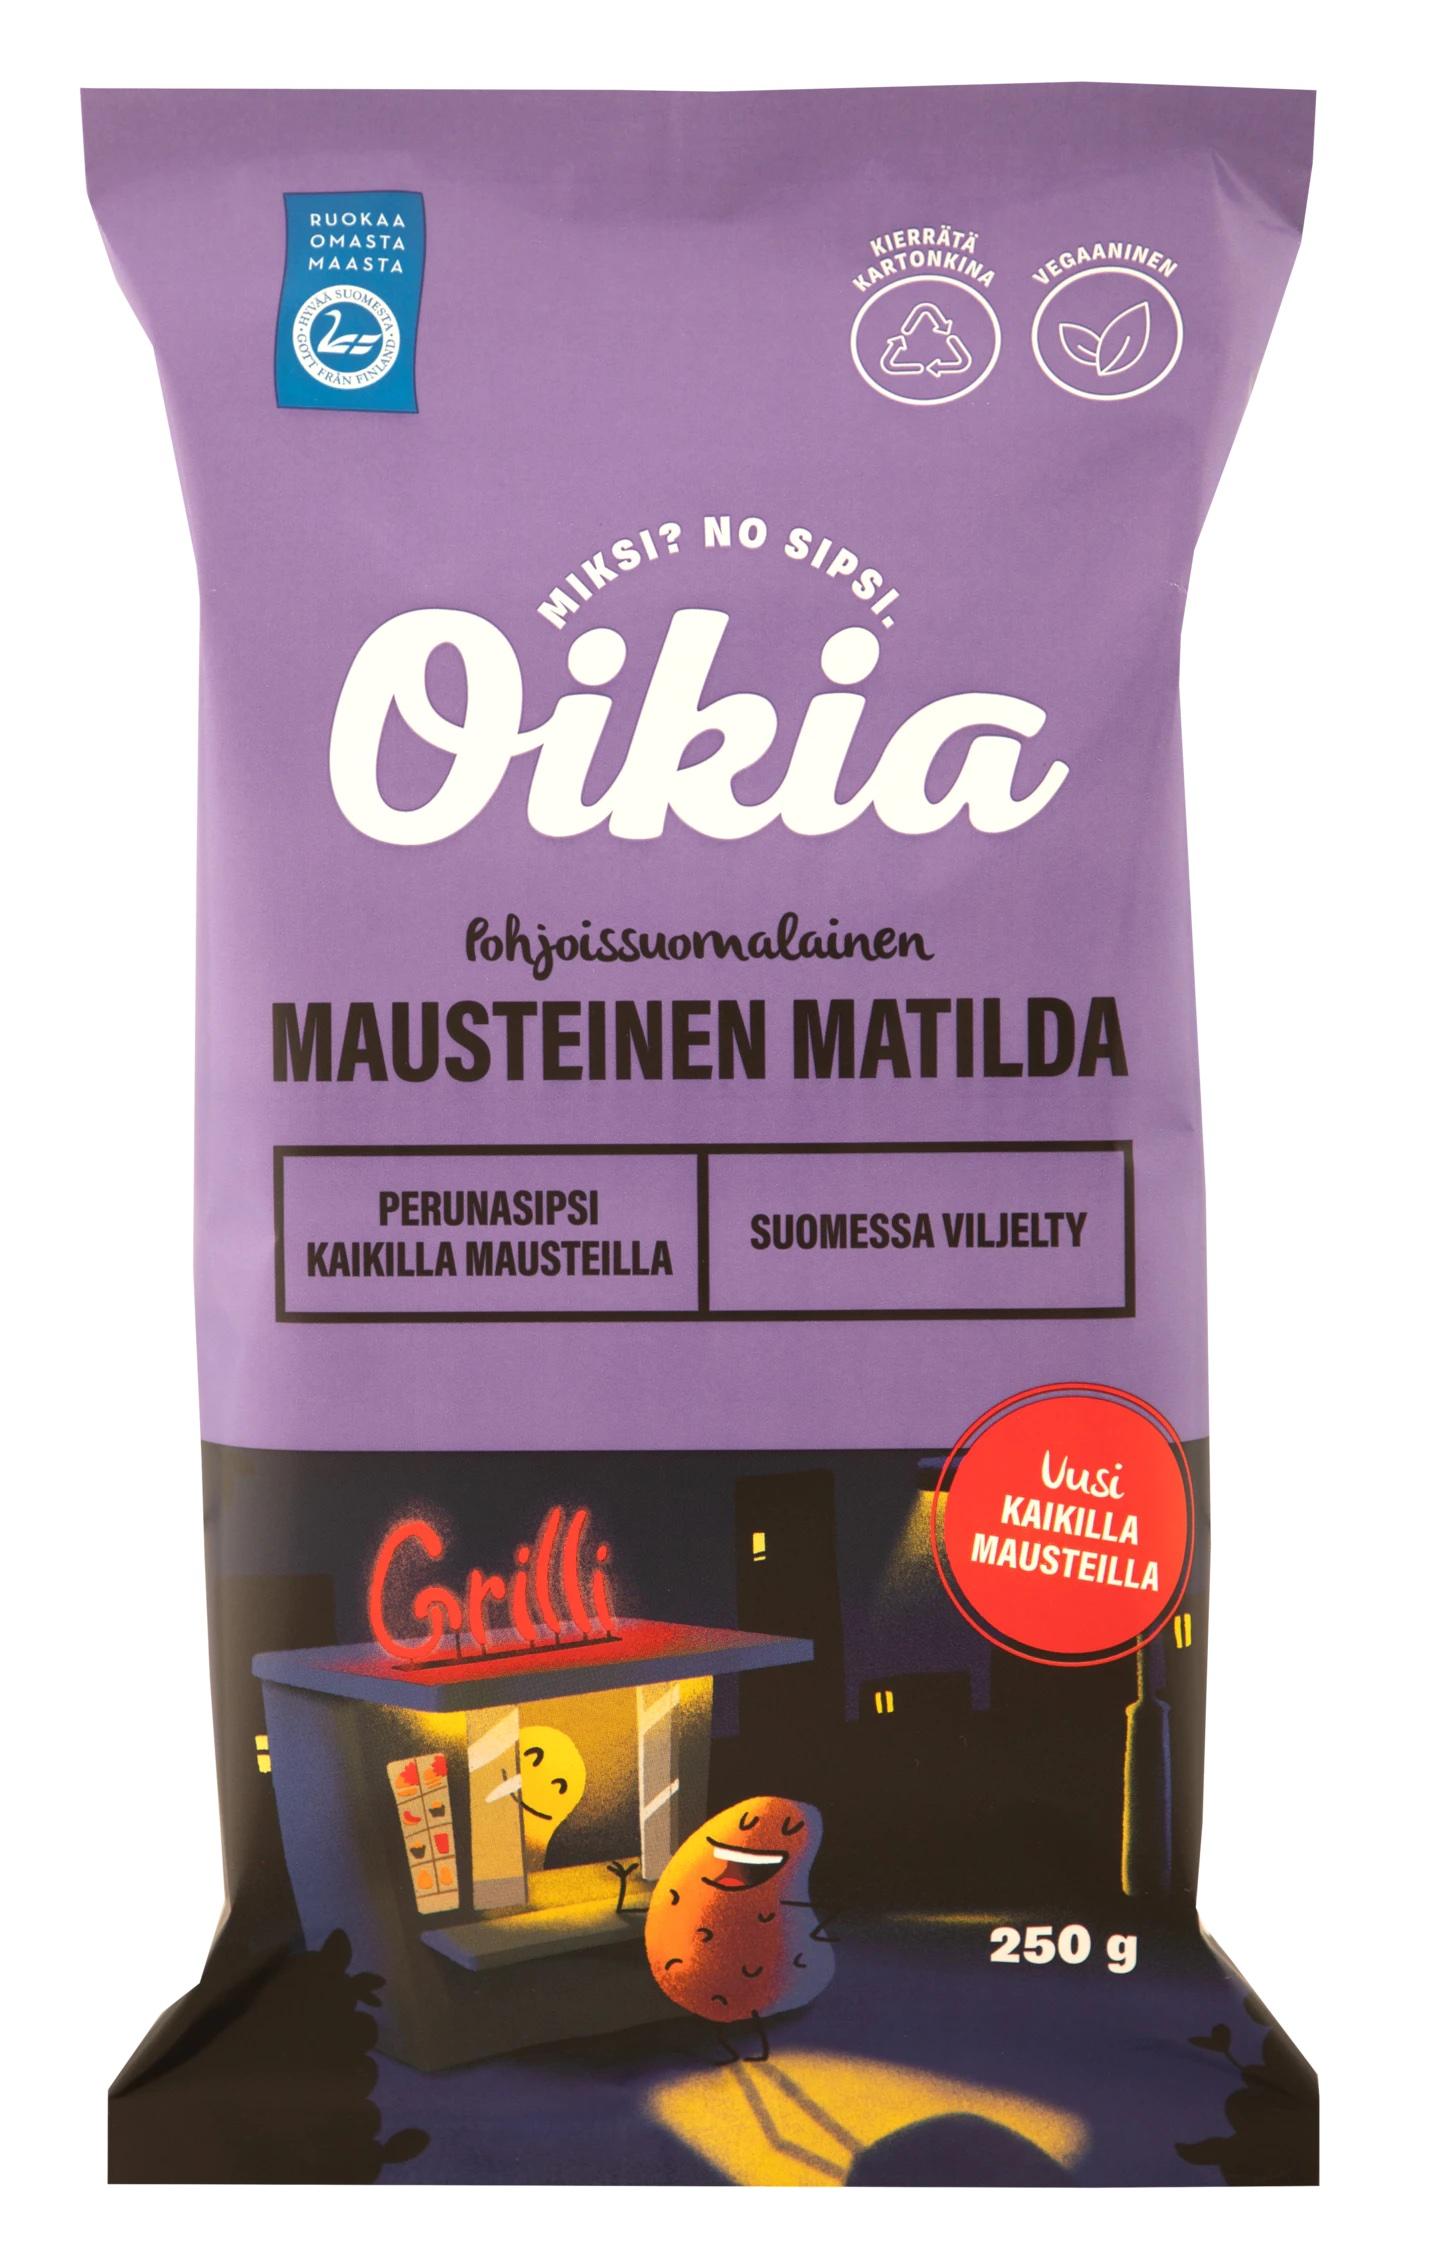 Oikia Mausteinen Matilda 250g